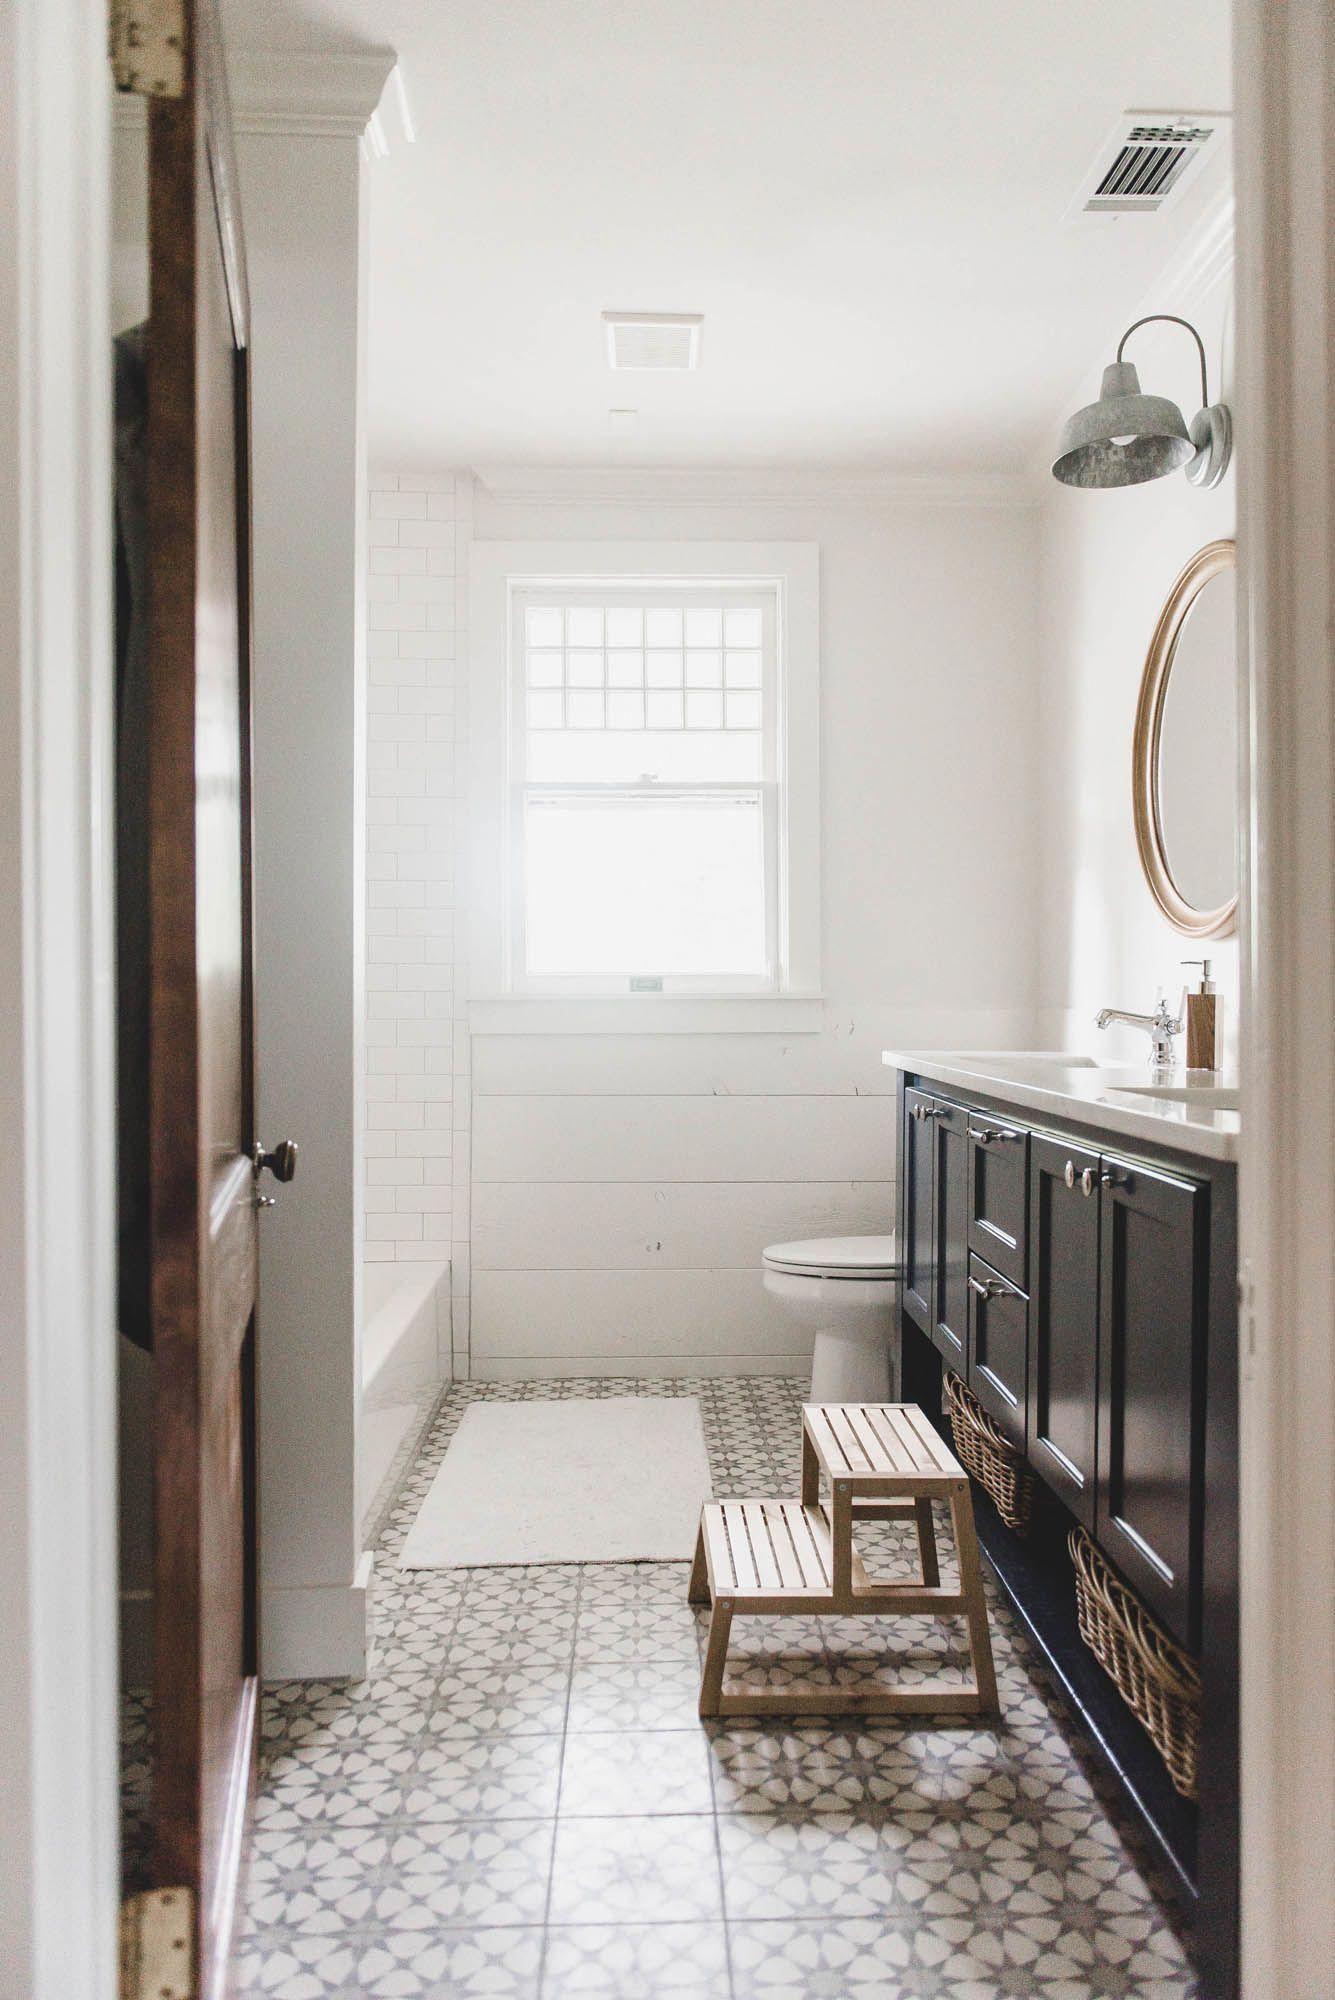 27 elegant white bathroom ideas to inspire your home on bathroom renovation ideas white id=72790